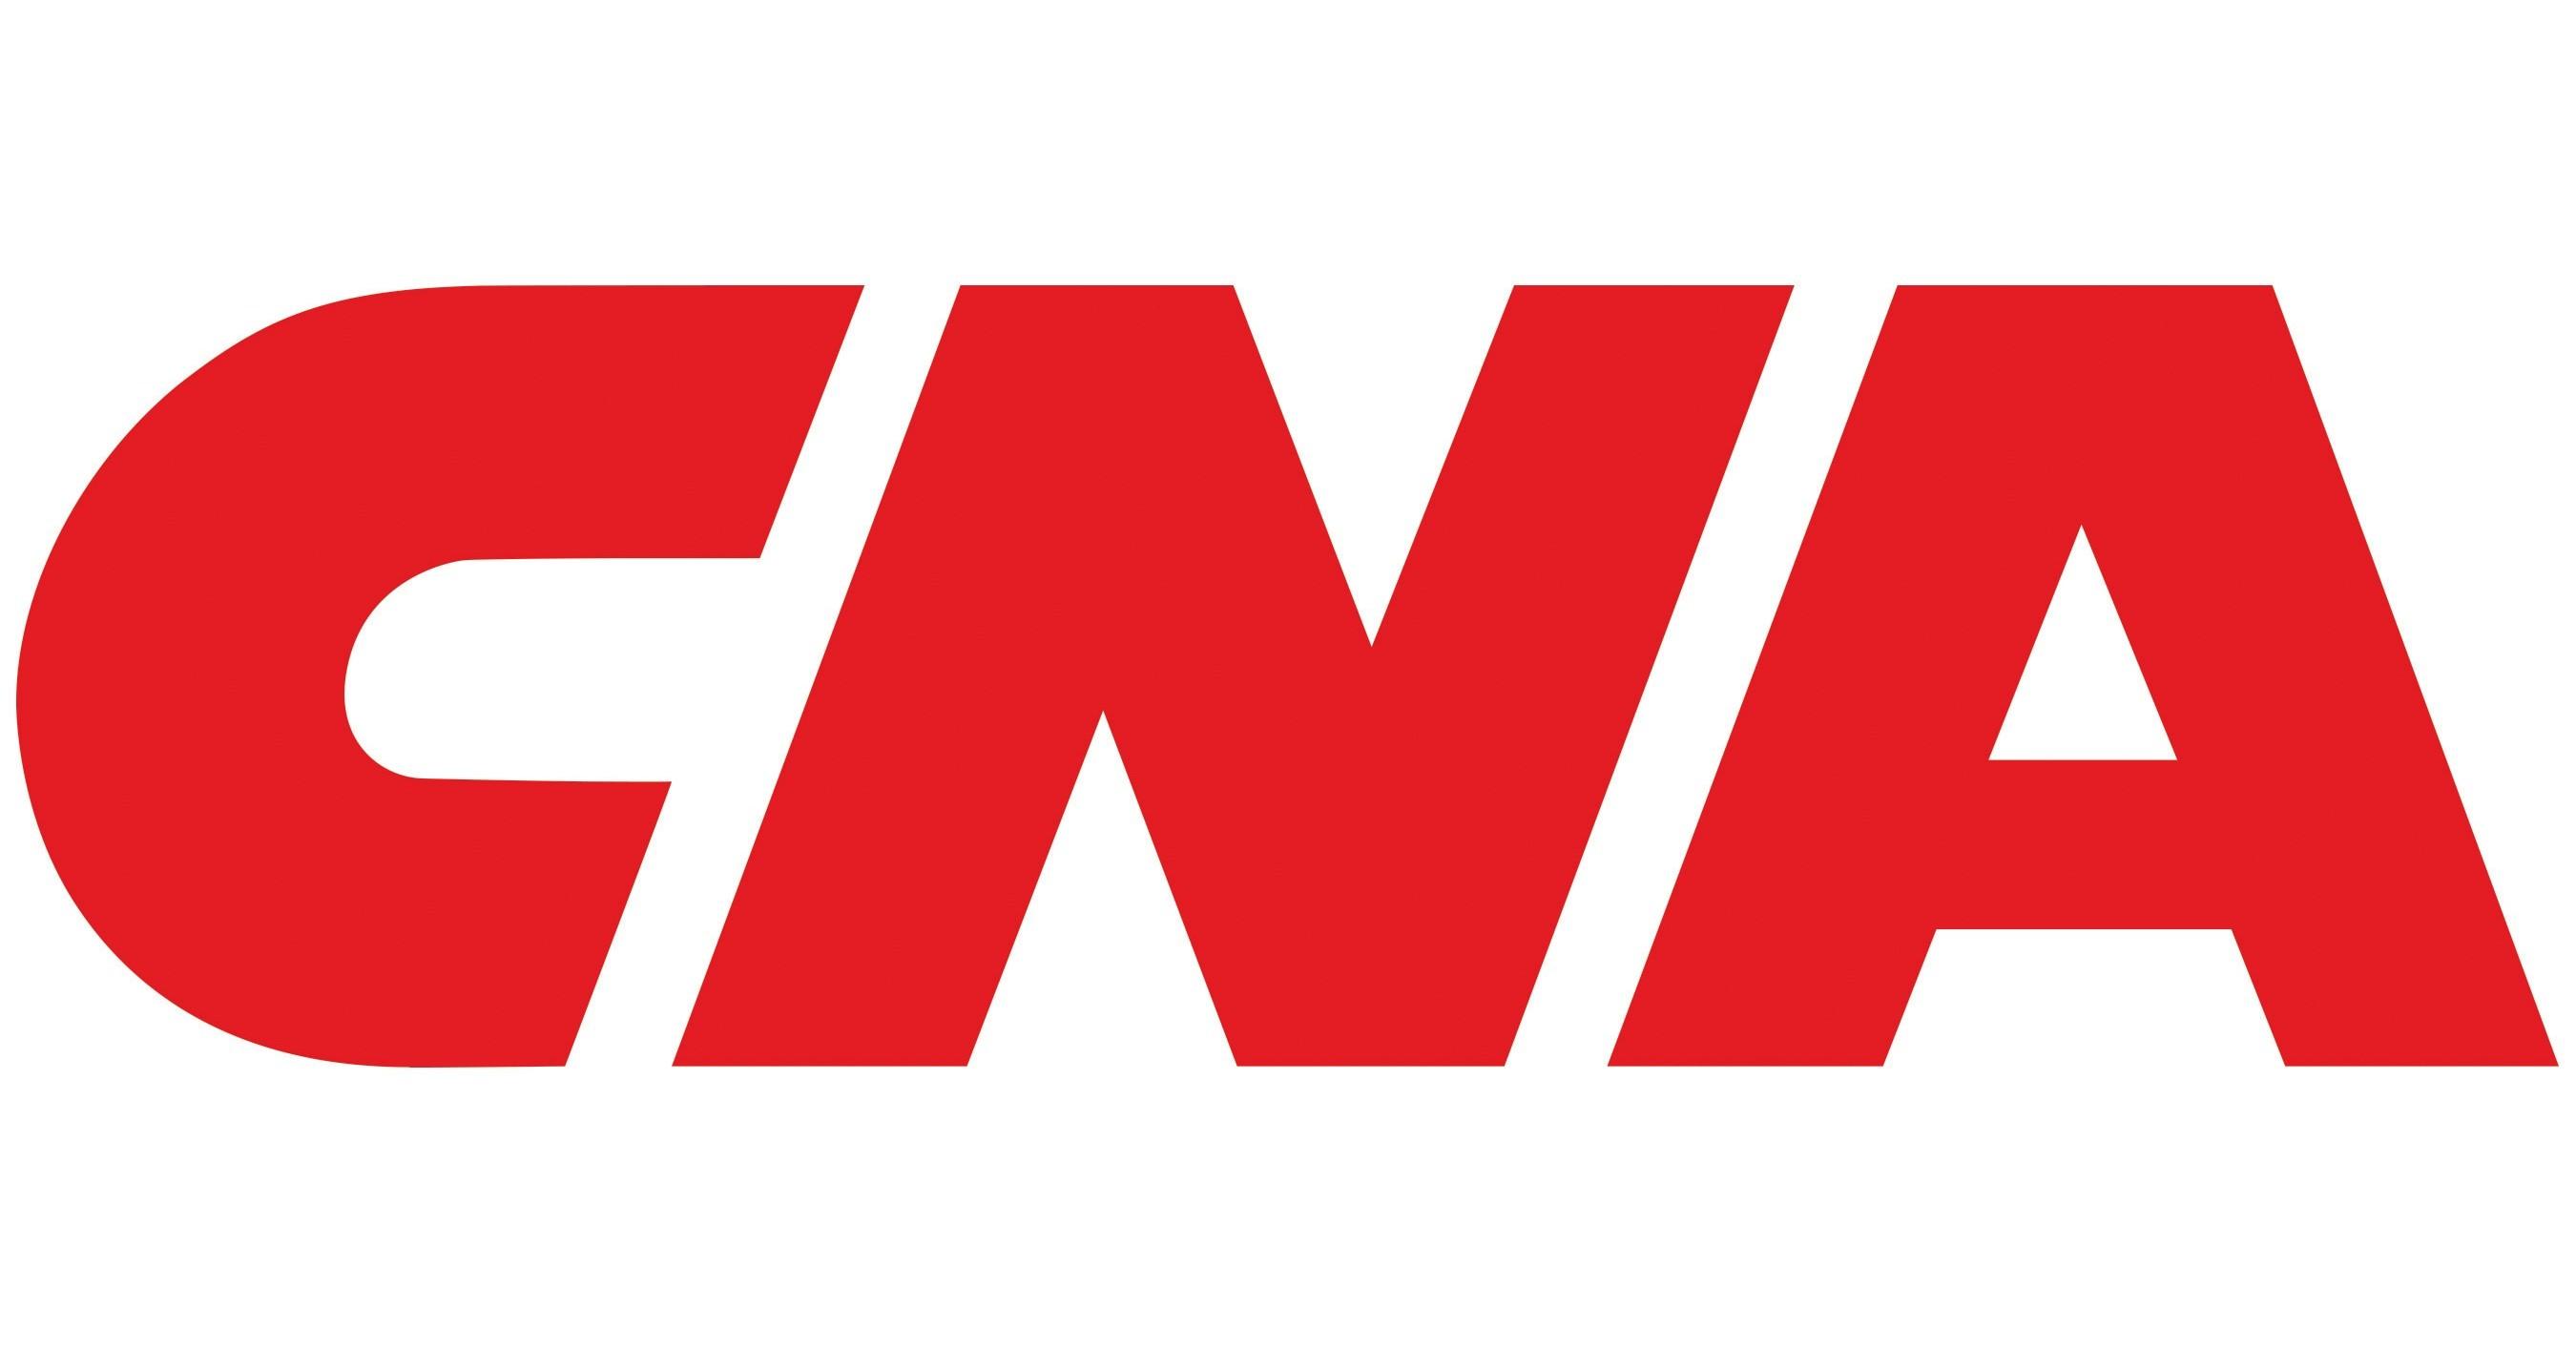 CNA FINANCIAL CORPORATION LOGO jpg?p=facebook.